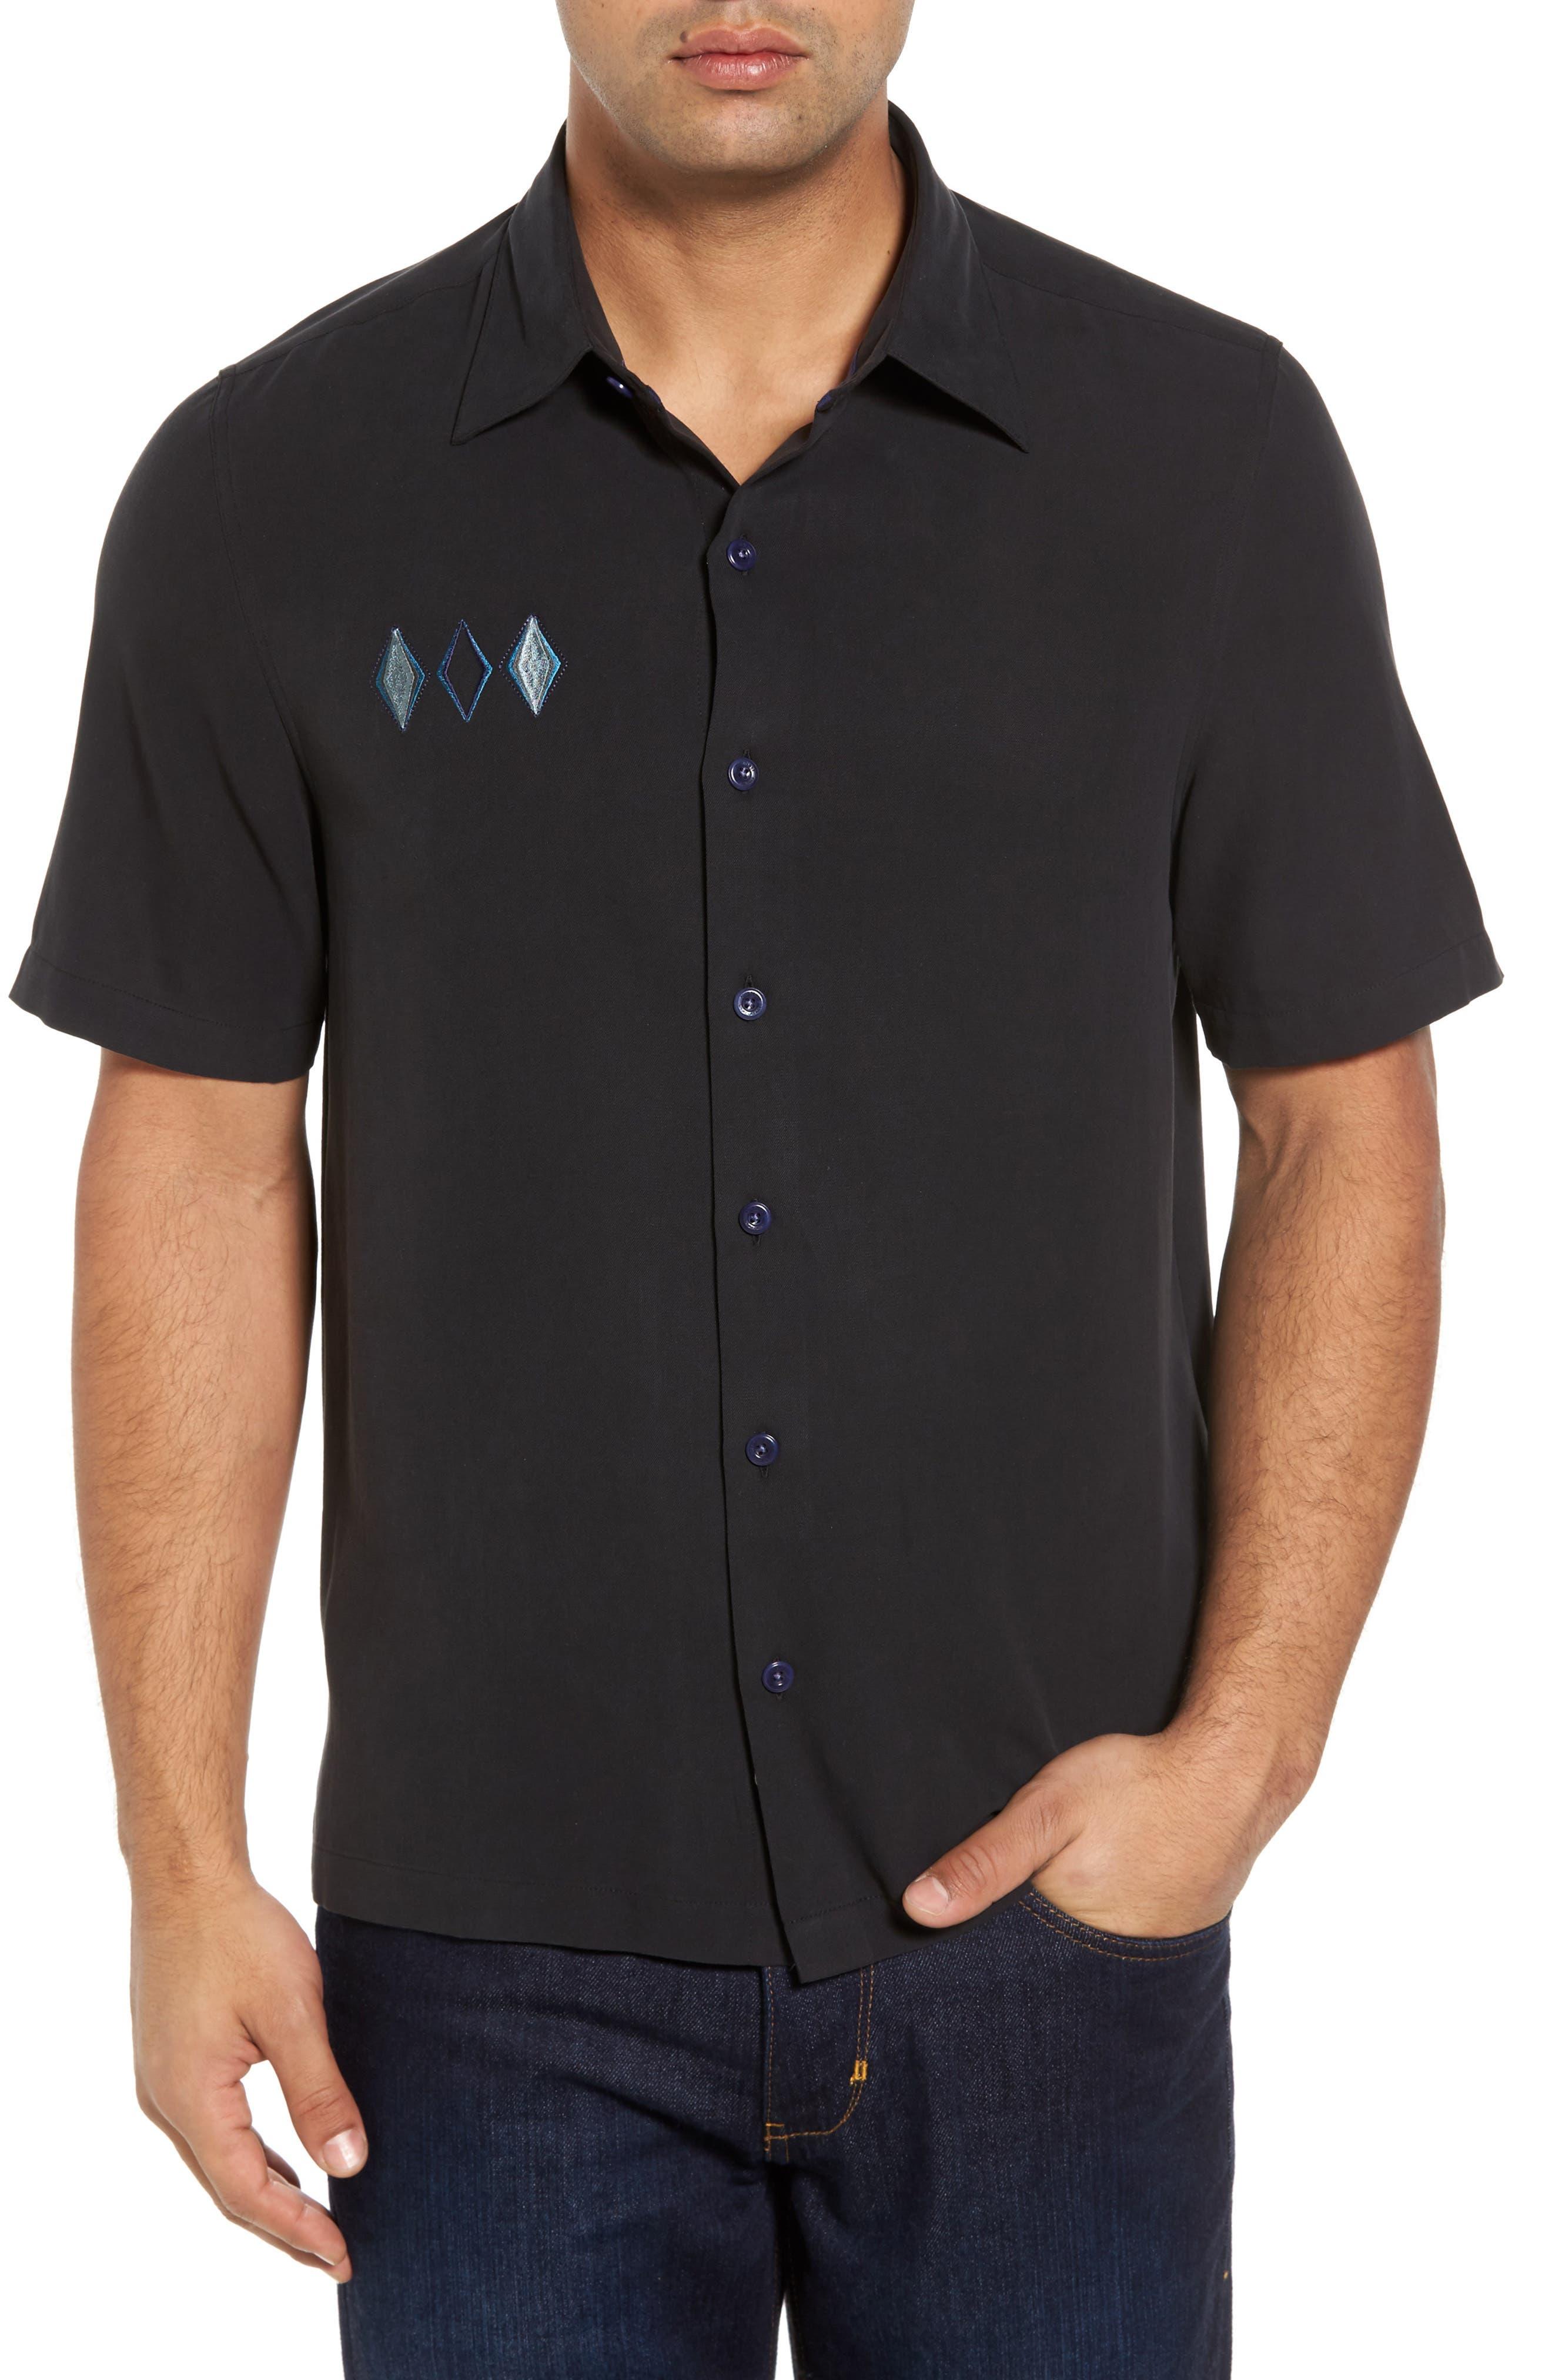 Black Diamond Regular Fit Embroidered Silk Blend Sport Shirt,                             Main thumbnail 1, color,                             Black